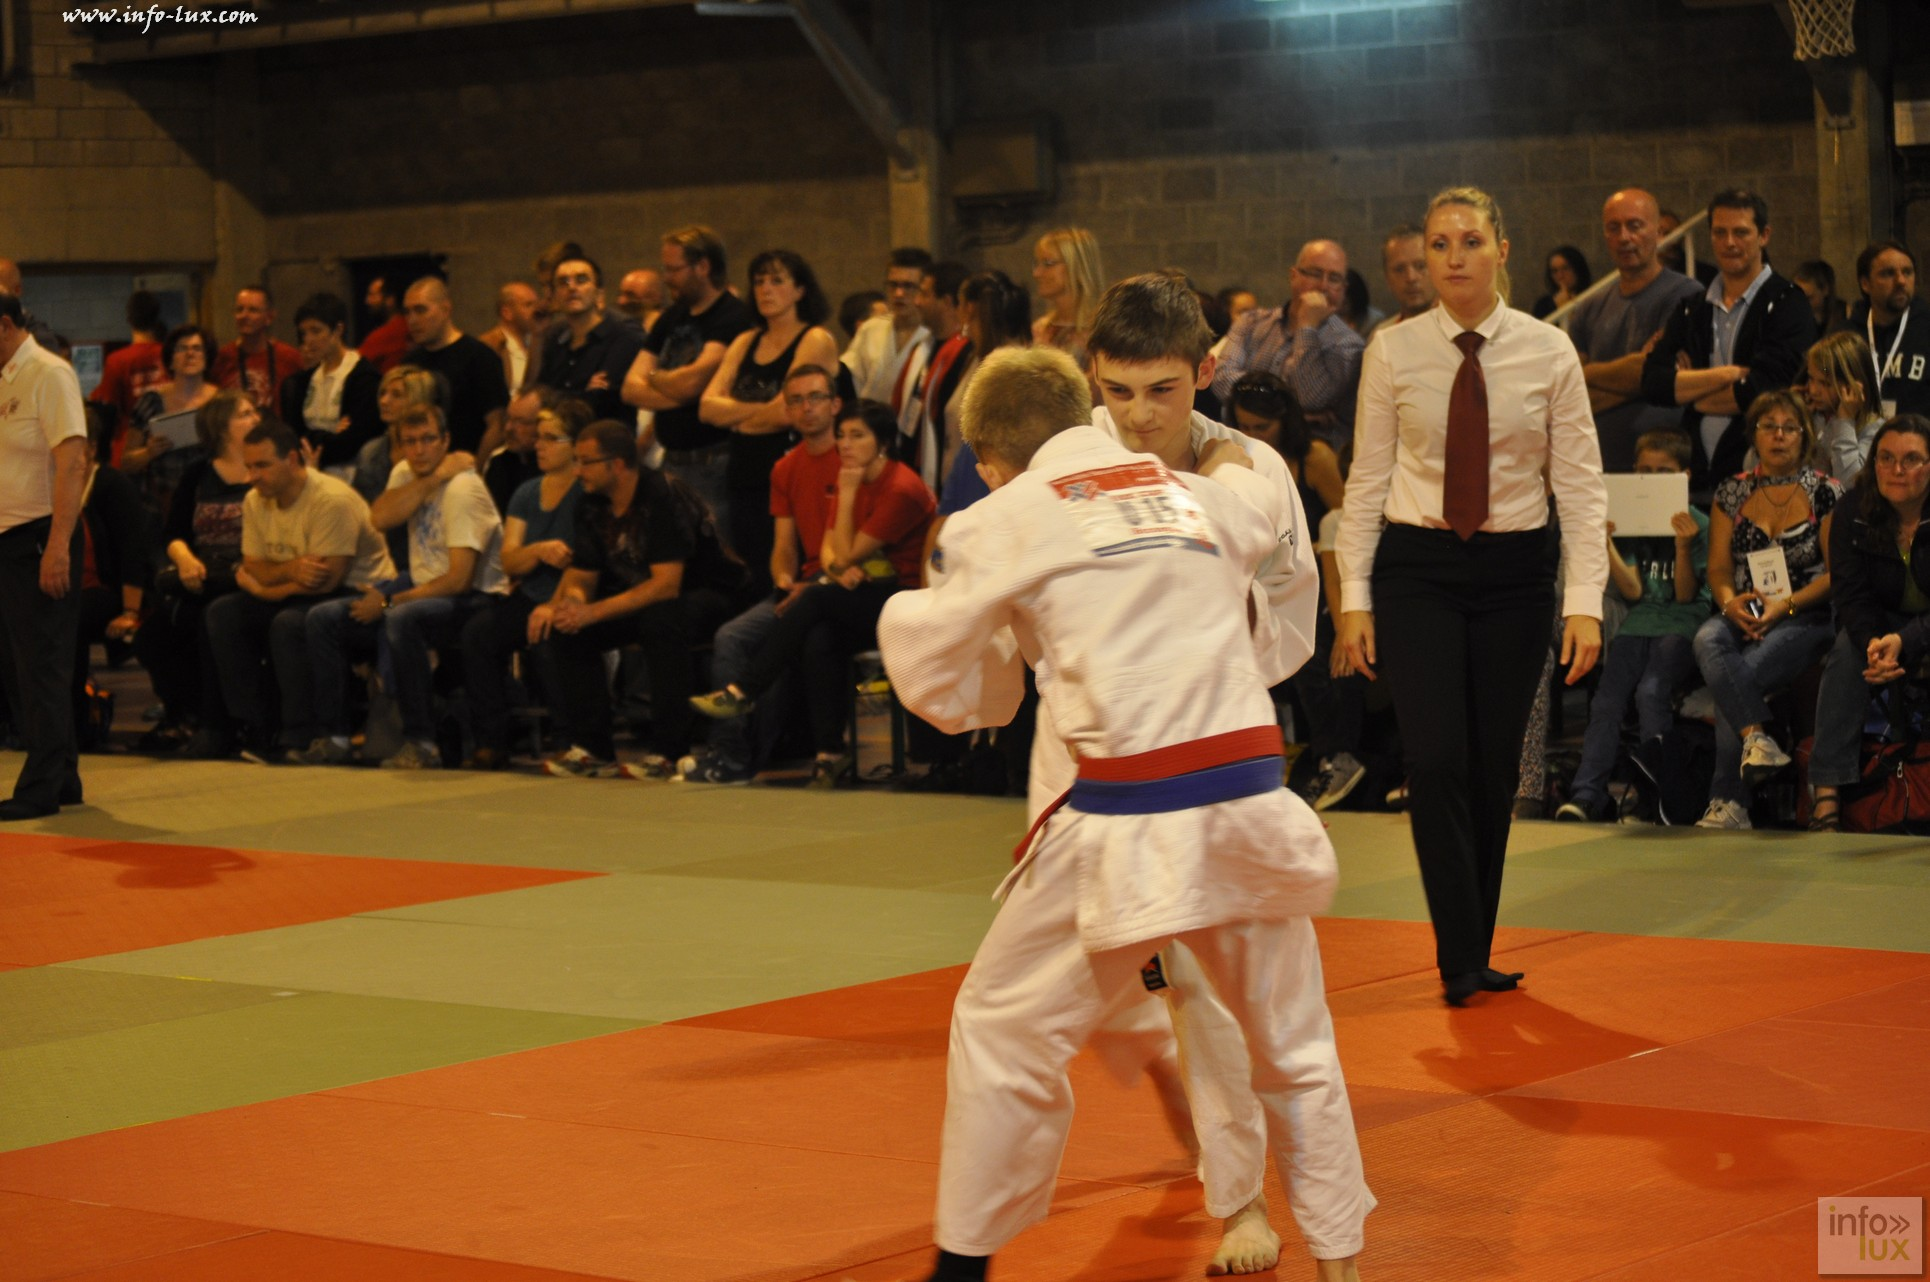 images/stories/PHOTOSREP/Bastogne/judo/Judo-Basto184